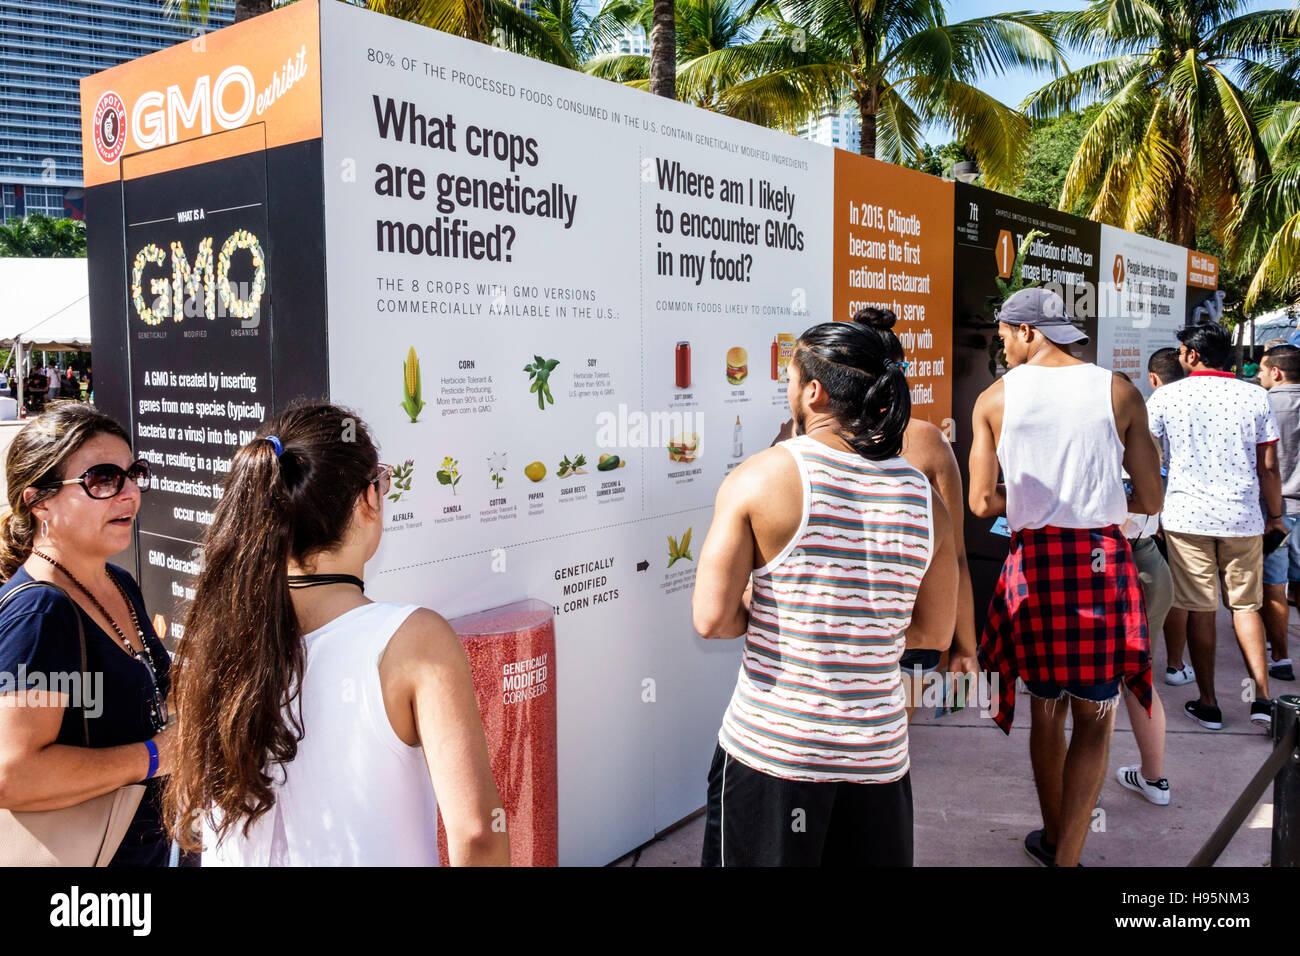 Miami Florida Bayfront Park Chipotle Cultivate Festival GMO exhibit genetically modified - Stock Image